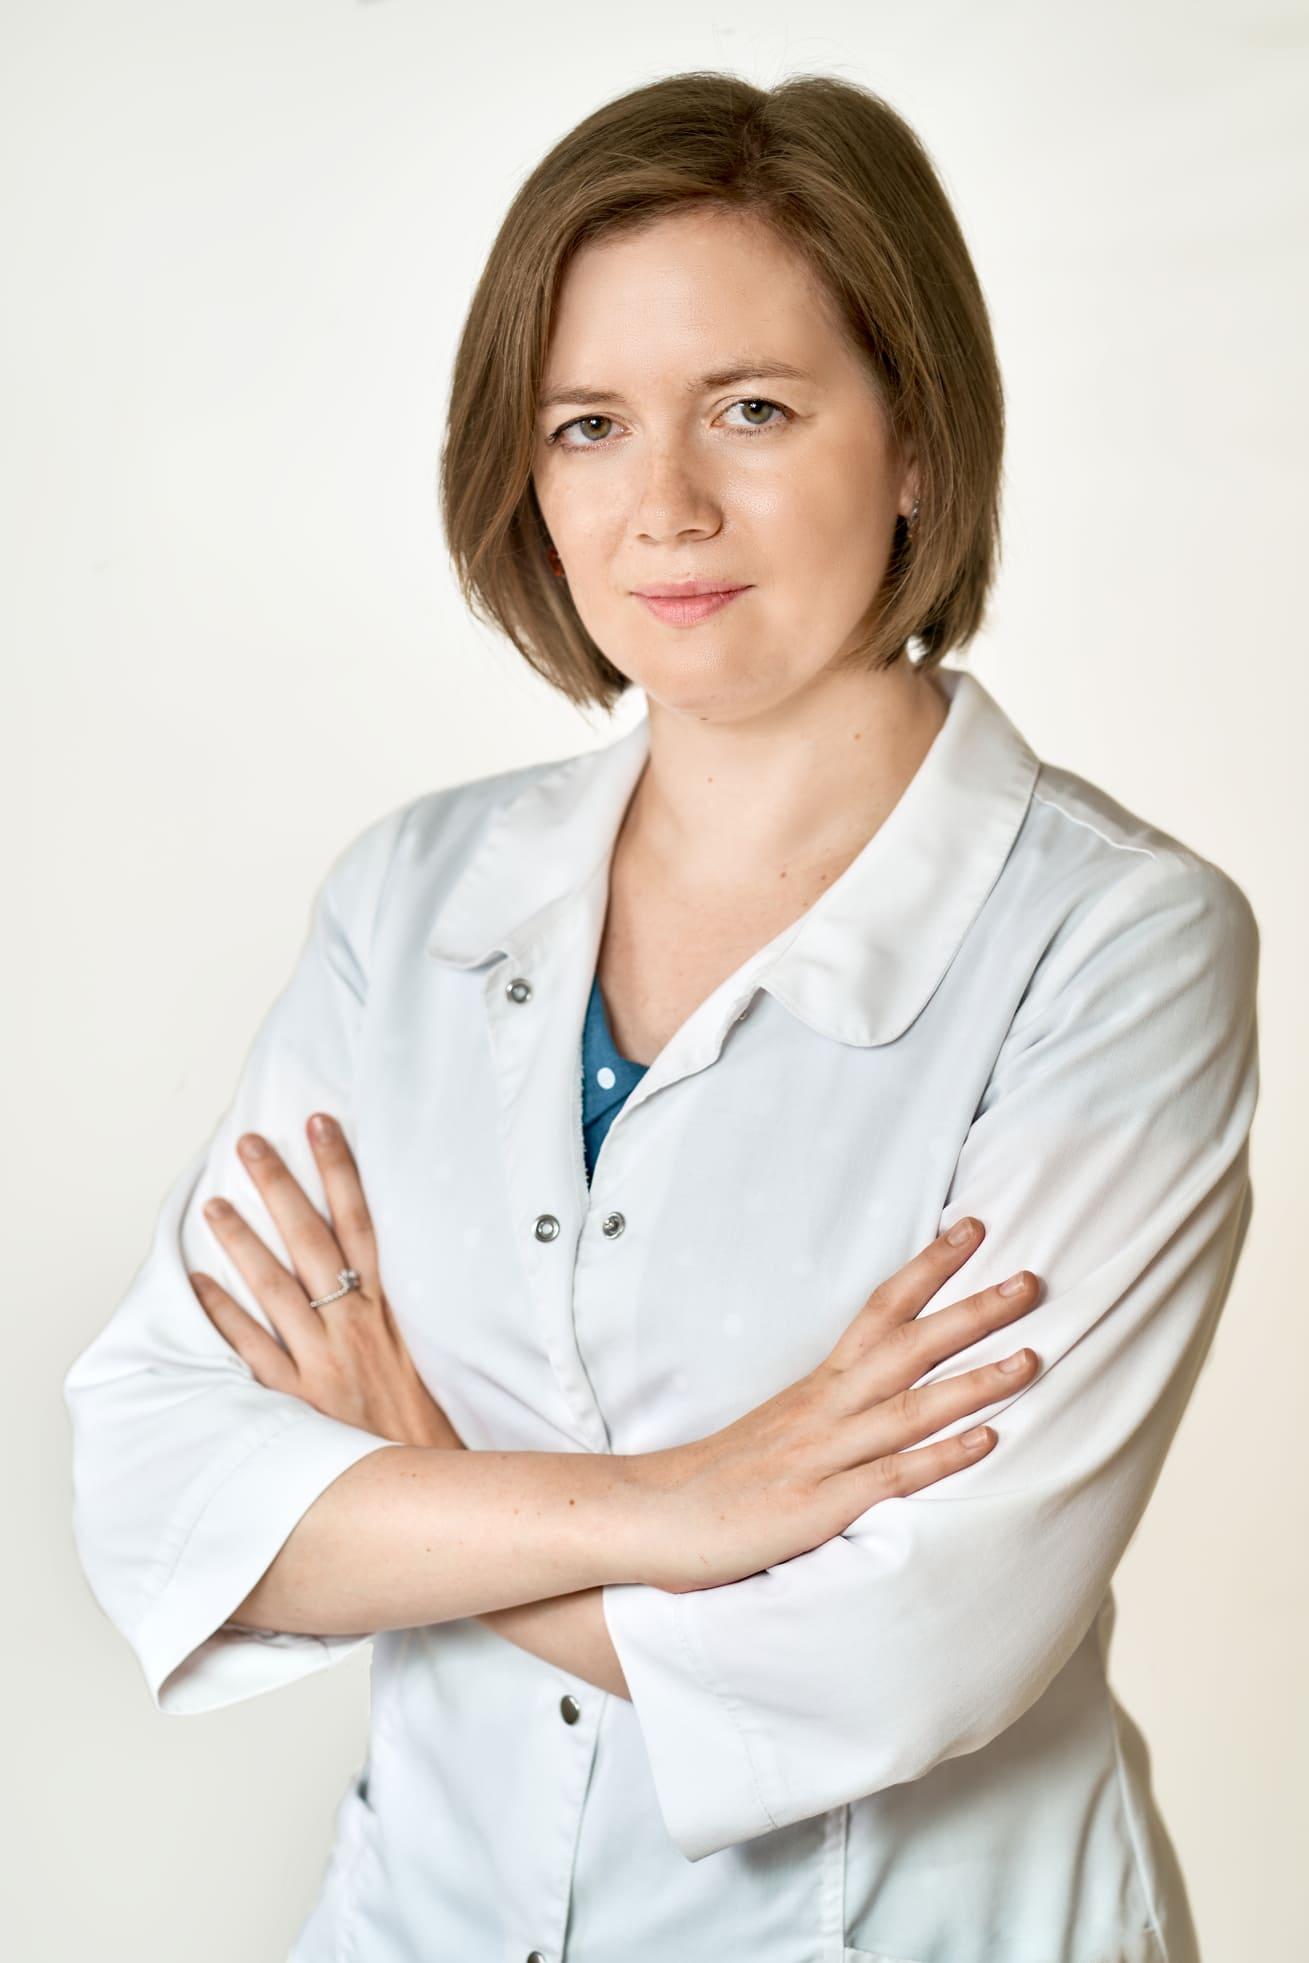 Корнышова Надежда Сергеевна (1) (1)